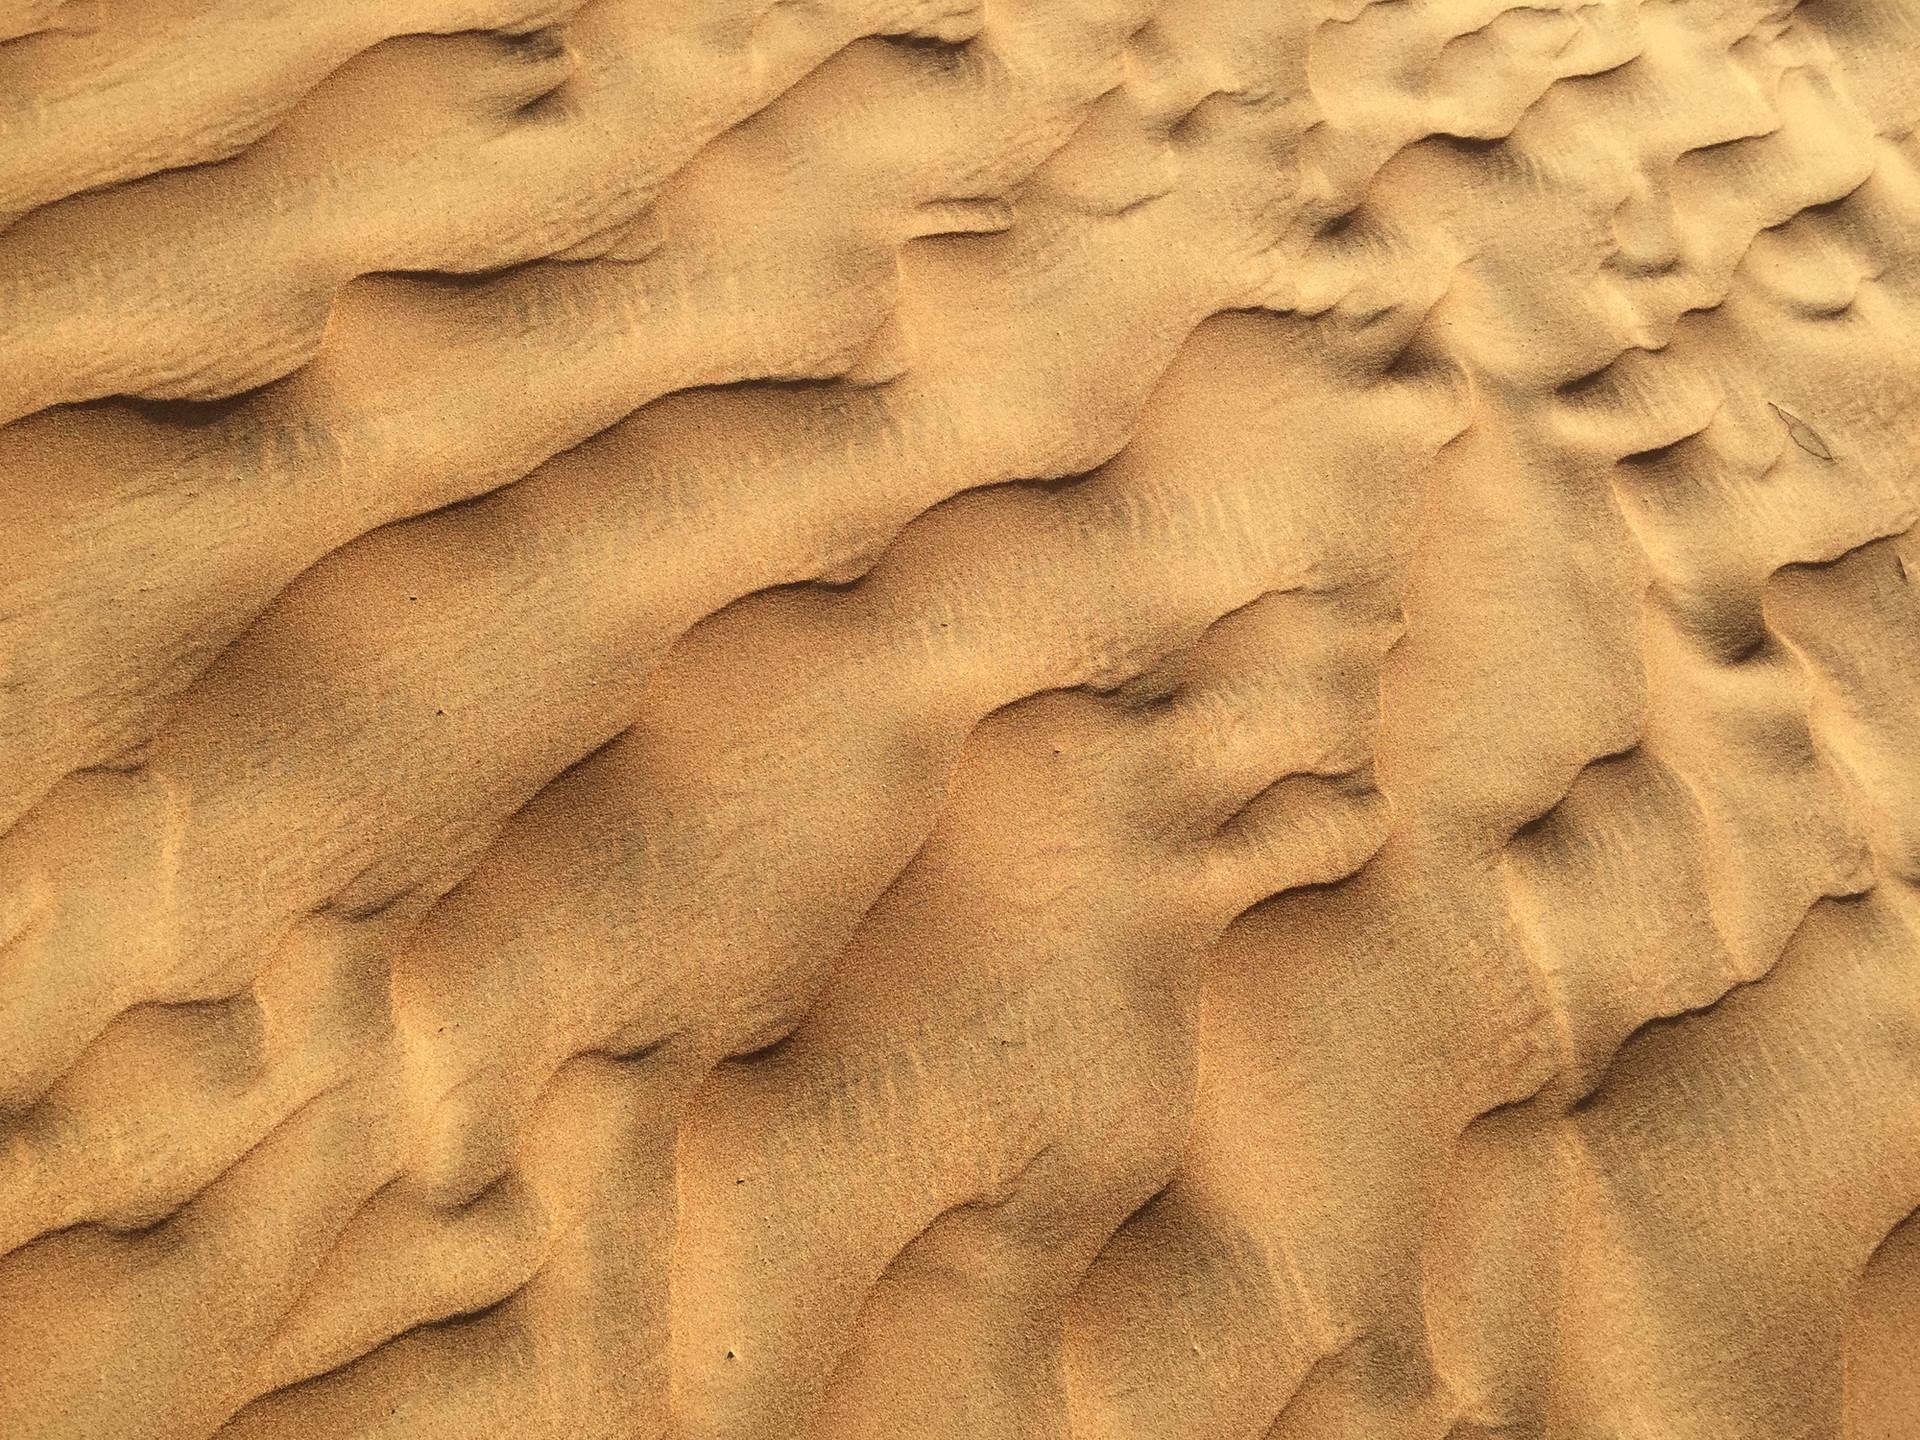 Sahara Desert, Kingdom of Saudi Arabia